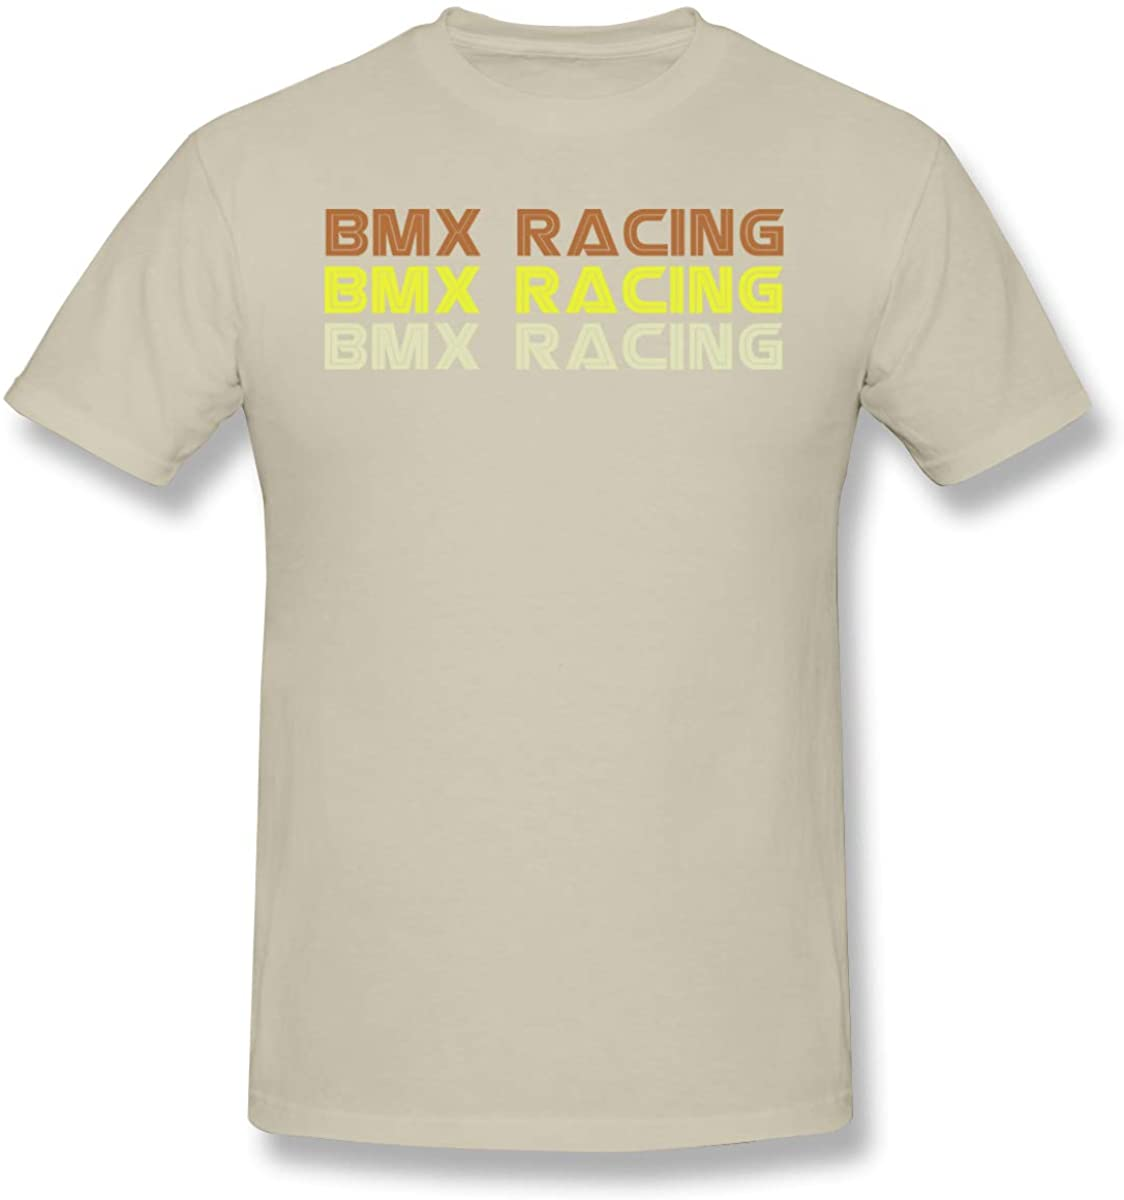 Warshland Men T-Shirts Printed Retro BMX Racing Short Sleeve T Shirt